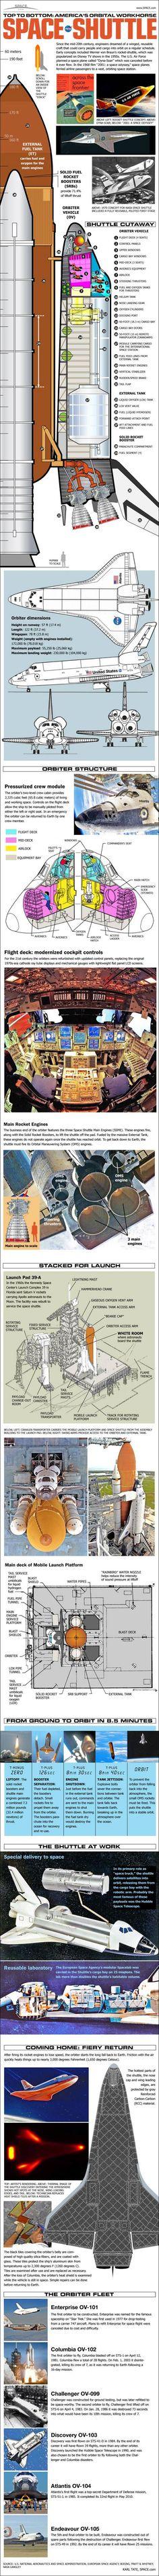 NASA Space Shuttle infograph